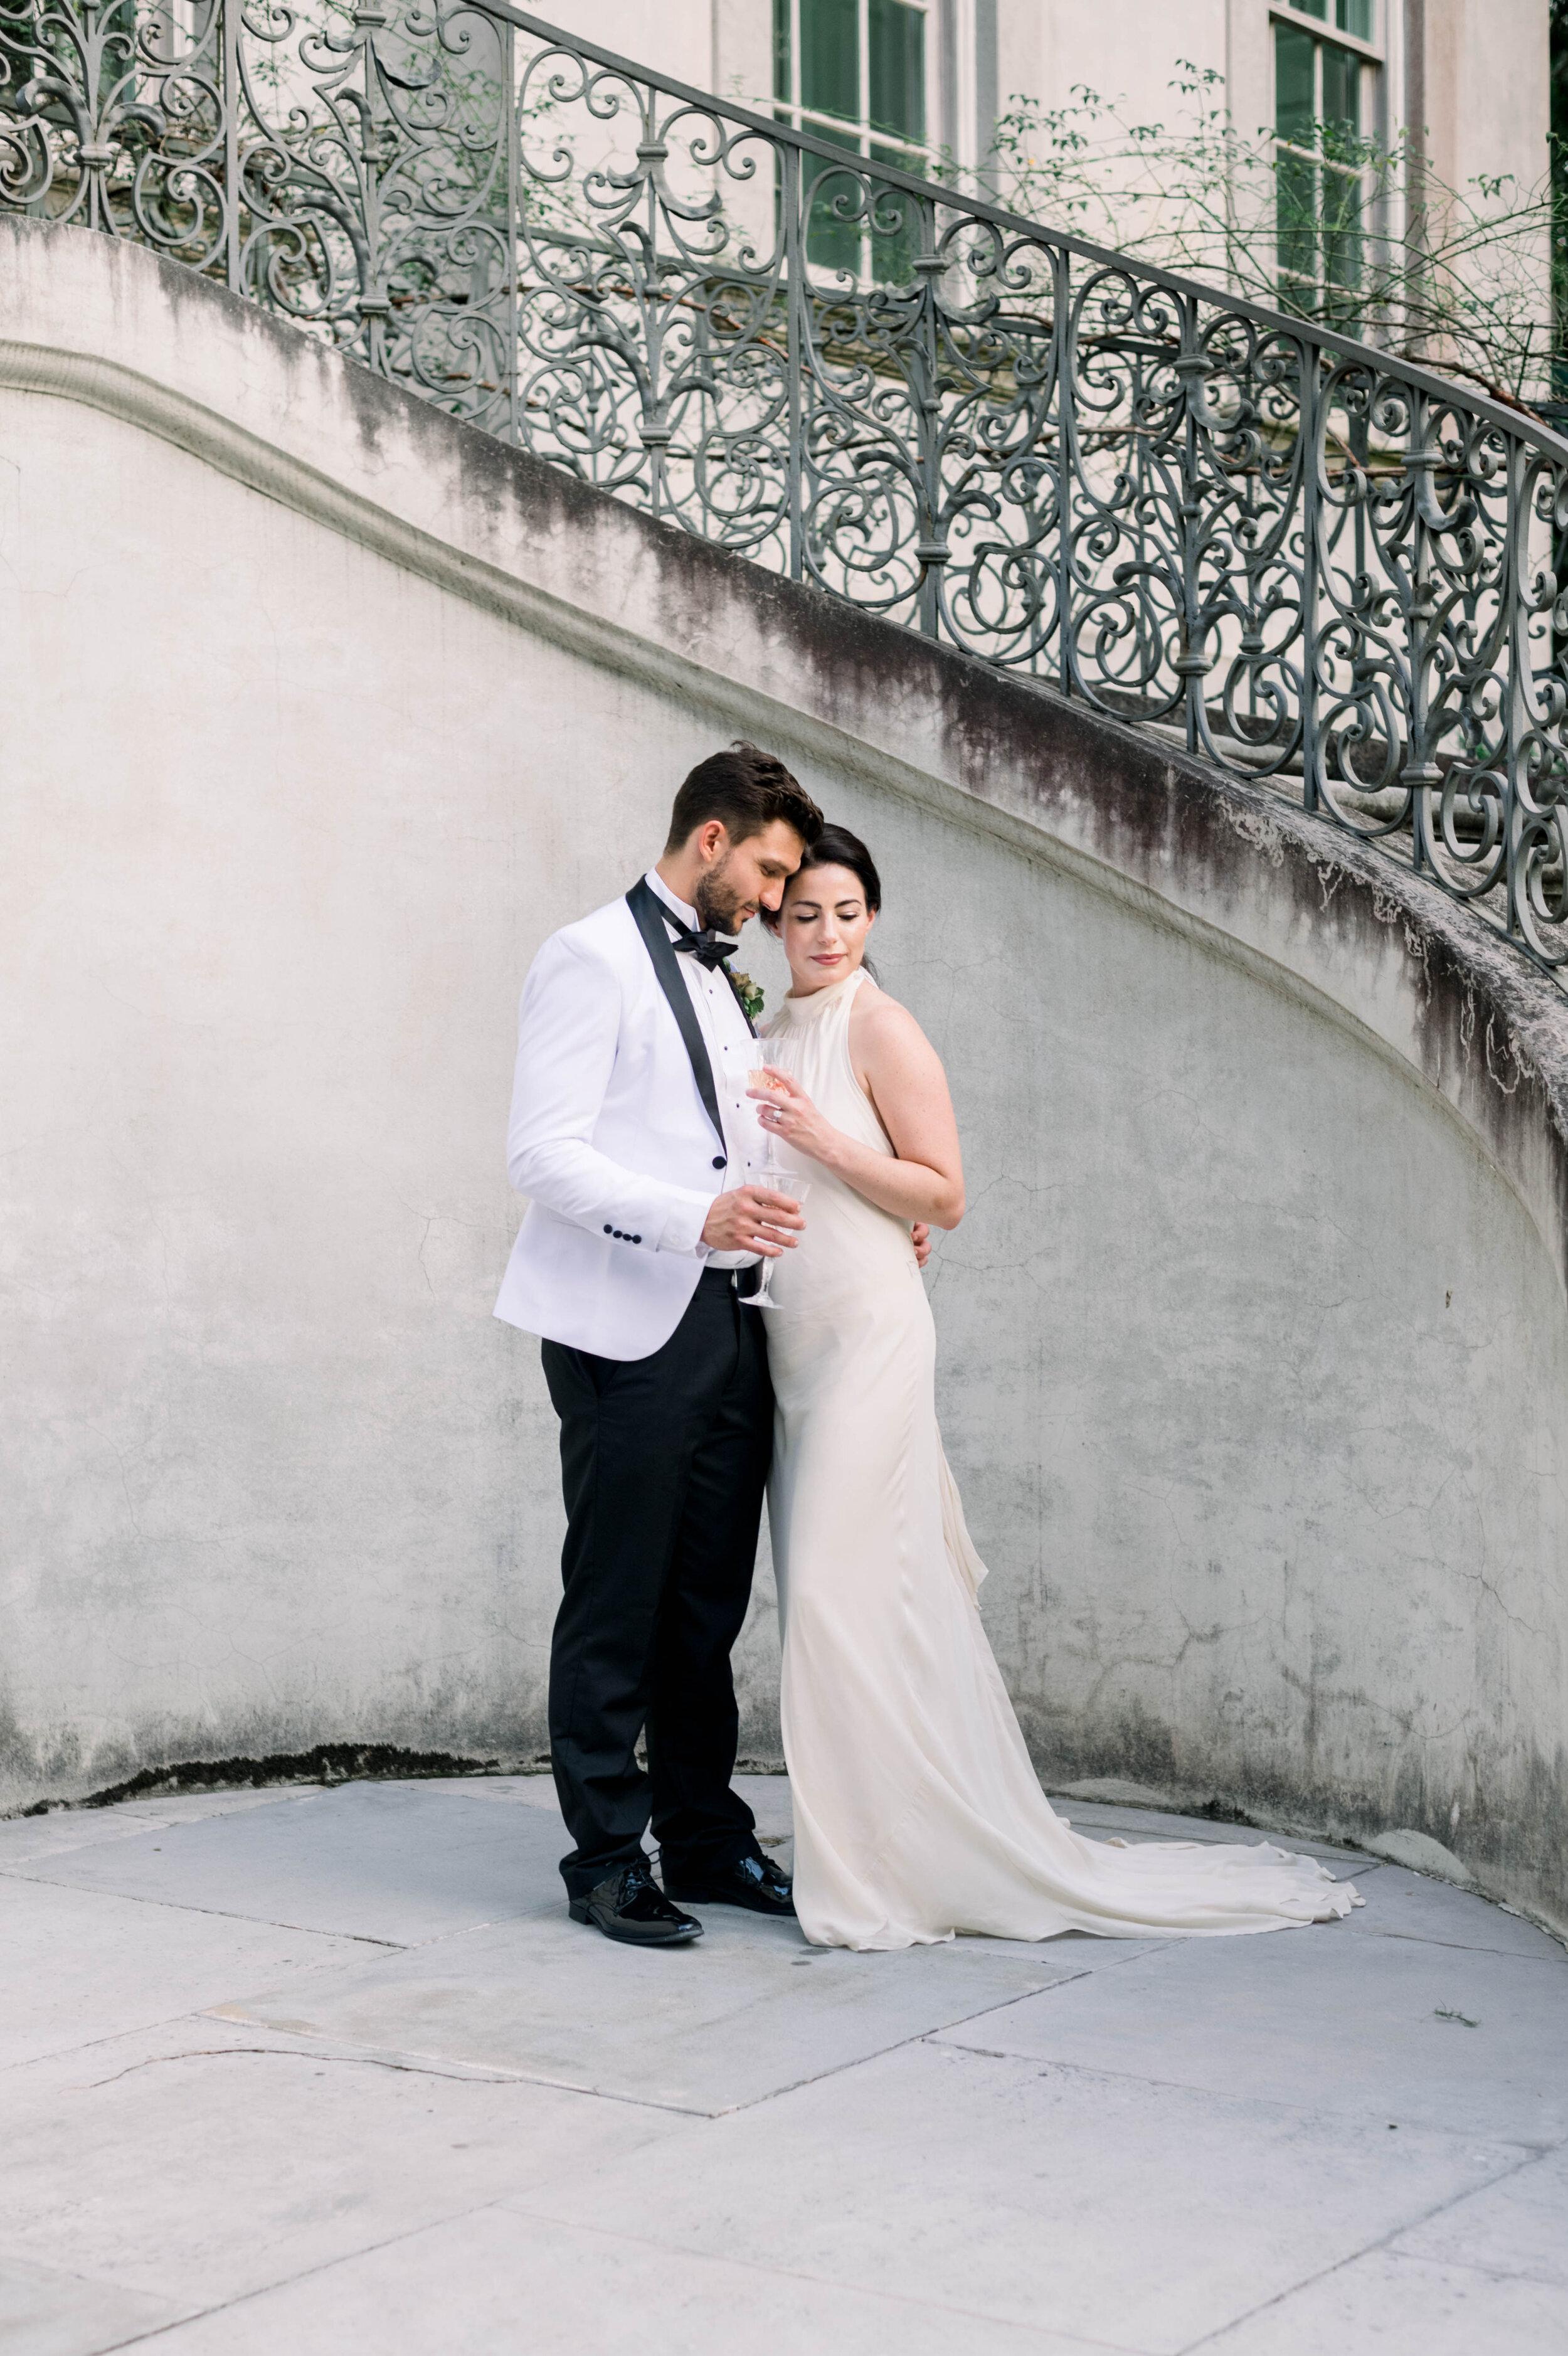 fine art wedding, Atlanta wedding, swan house wedding, modern wedding, rolls Royce wedding, swan house, high neck wedding dress, white tux, bride and groom portraits